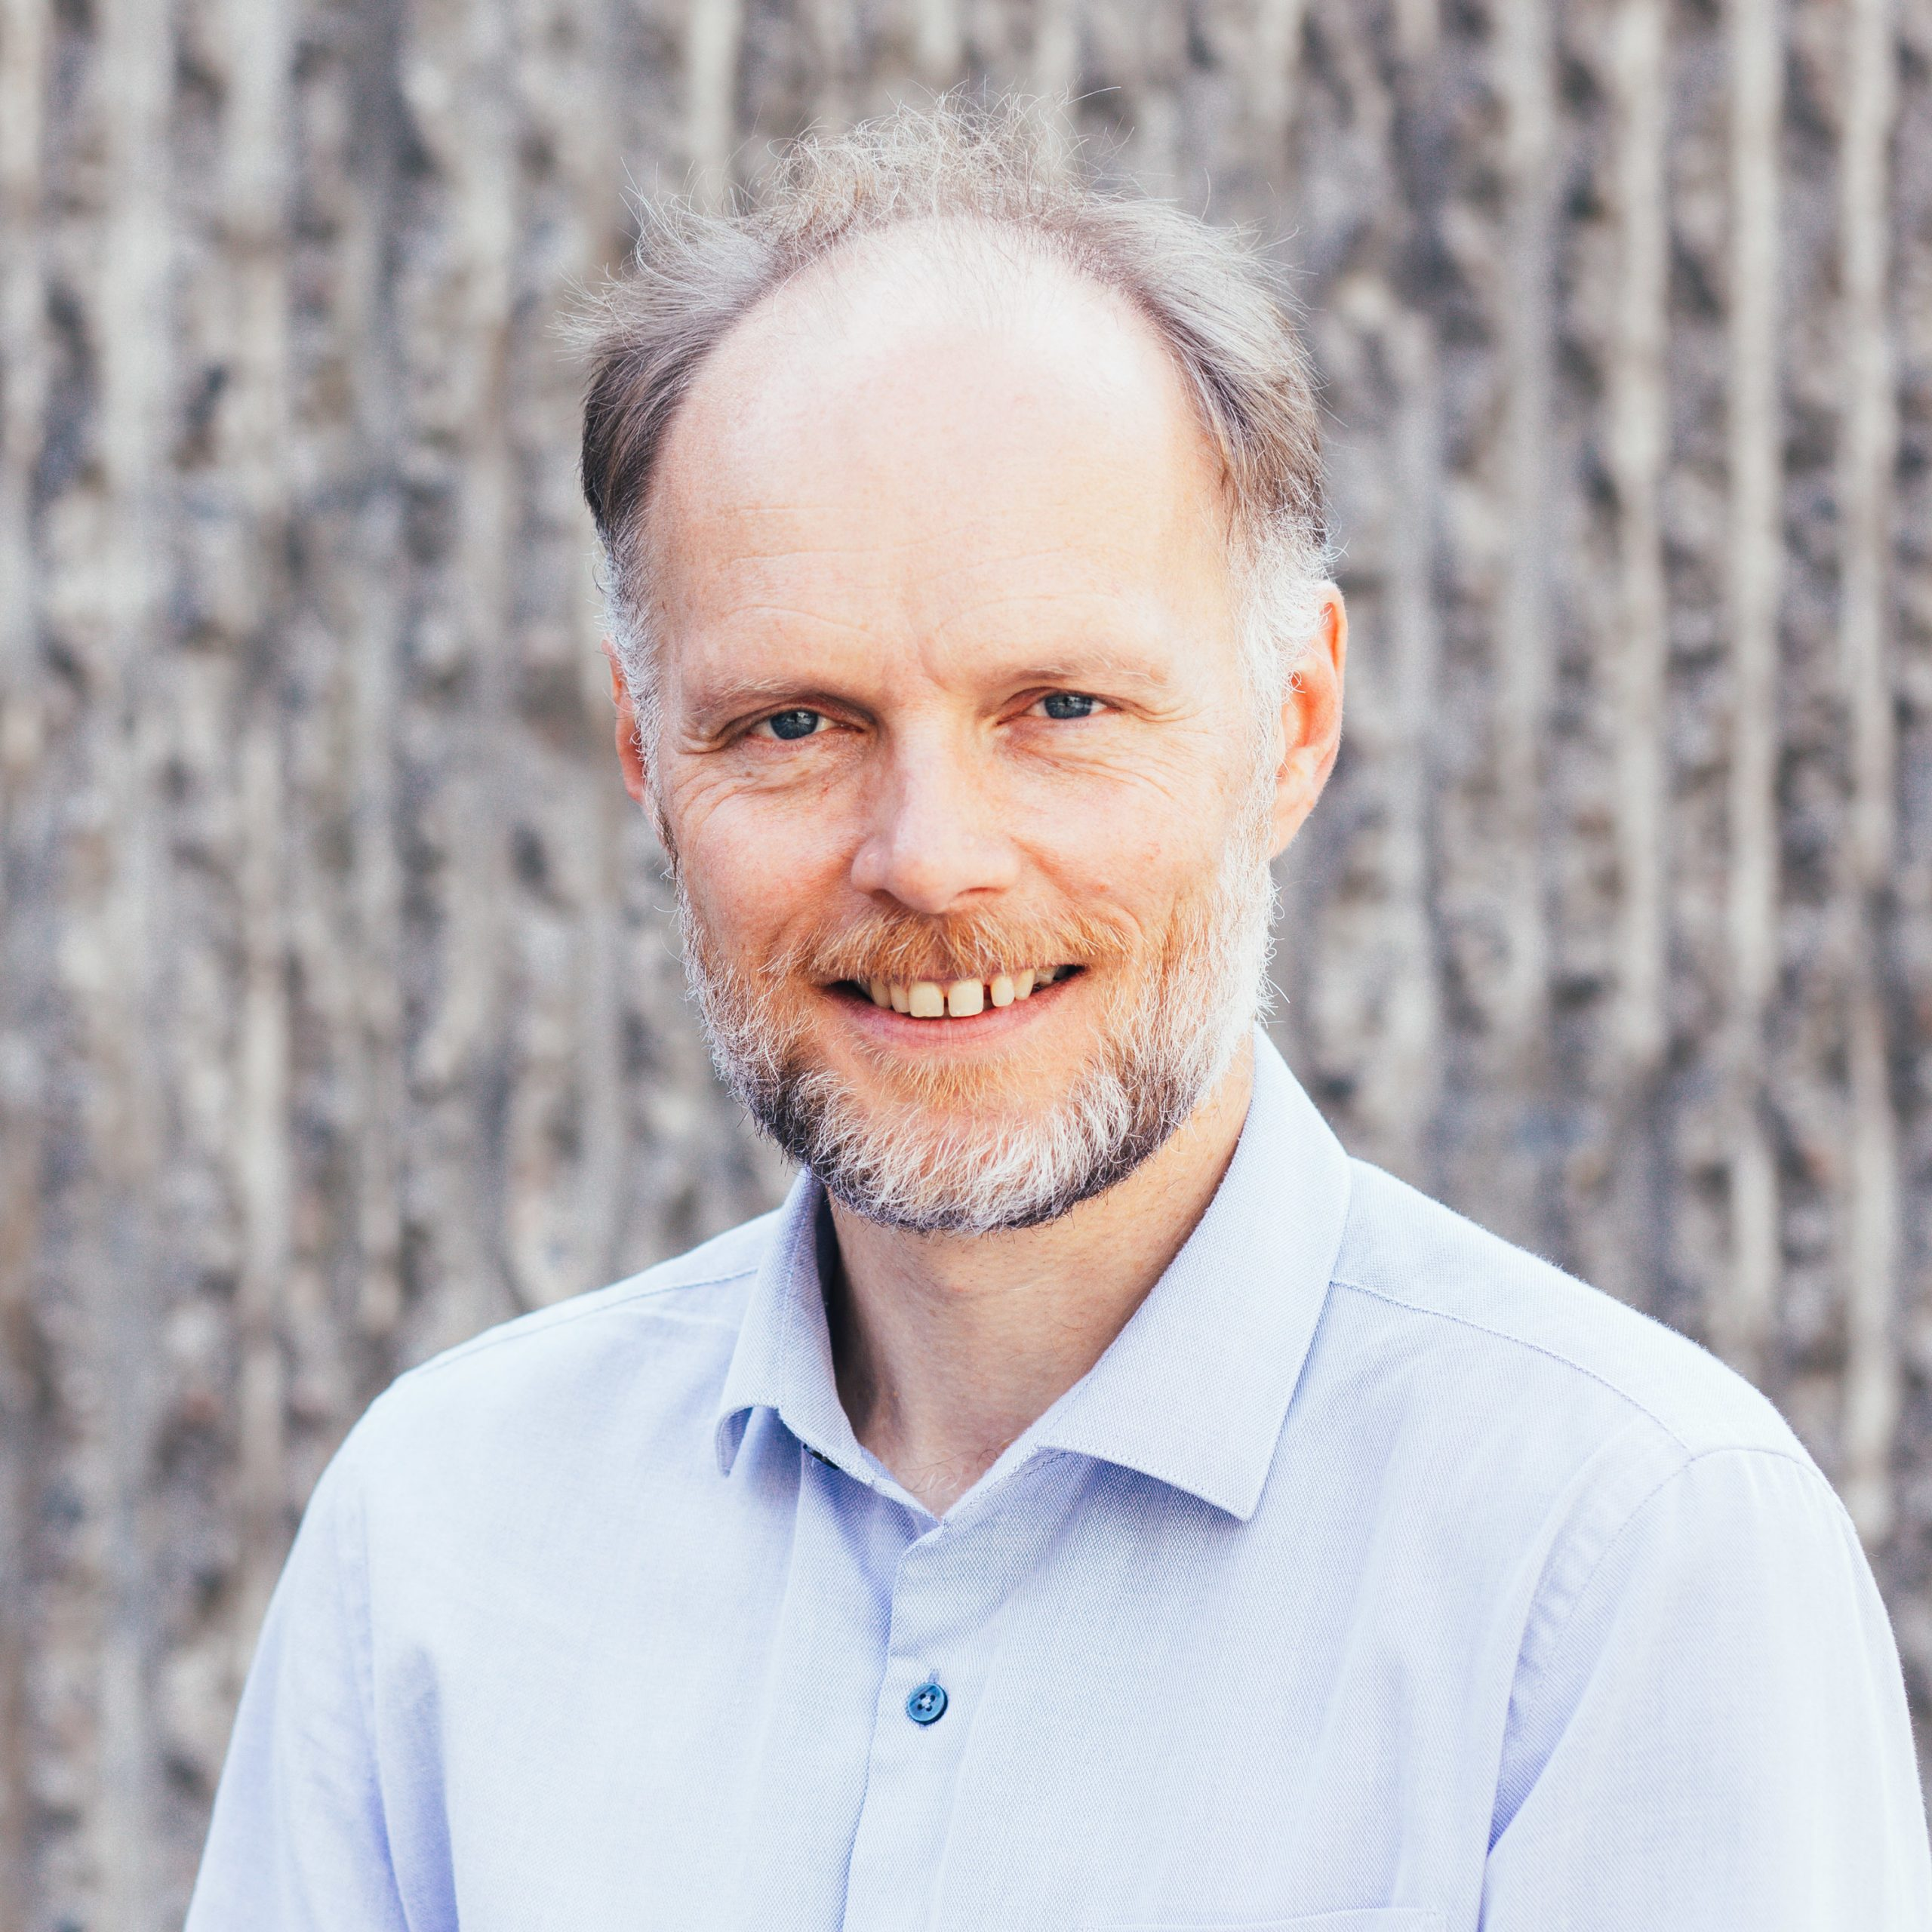 Hans Johan Sagrusten